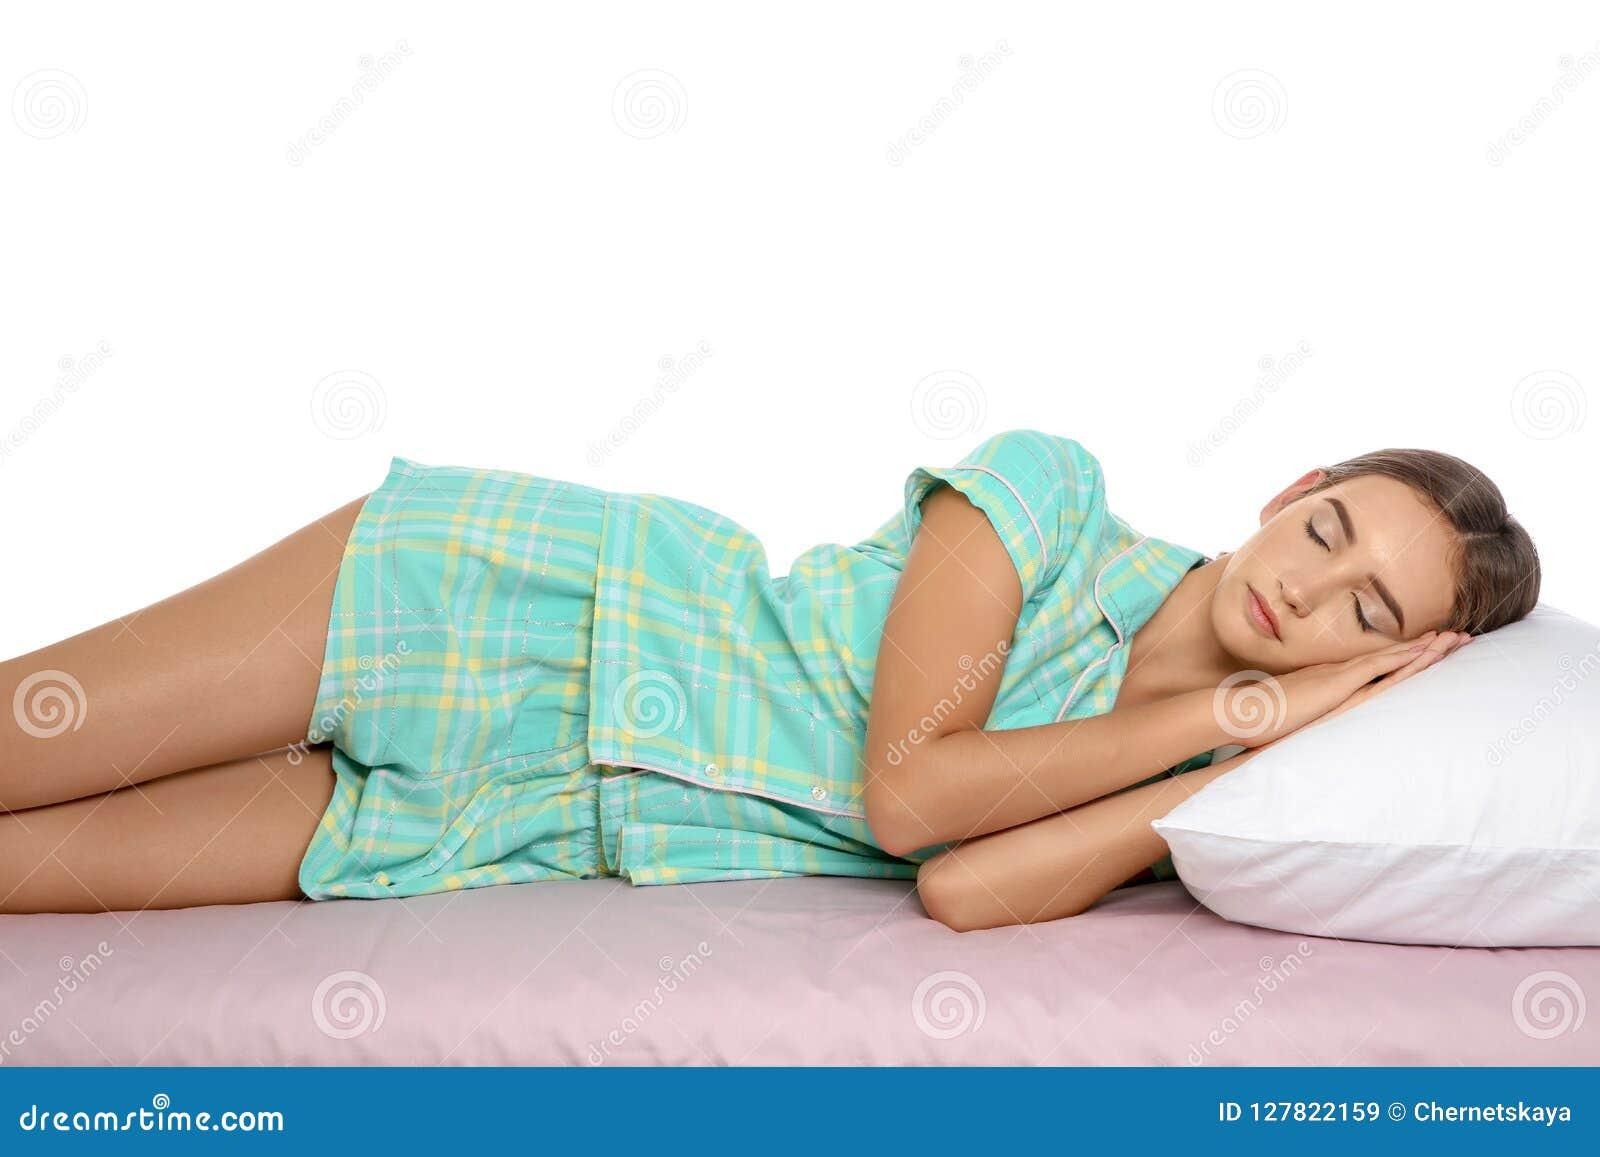 Massage st eriksplan svensk amatorporrfilm